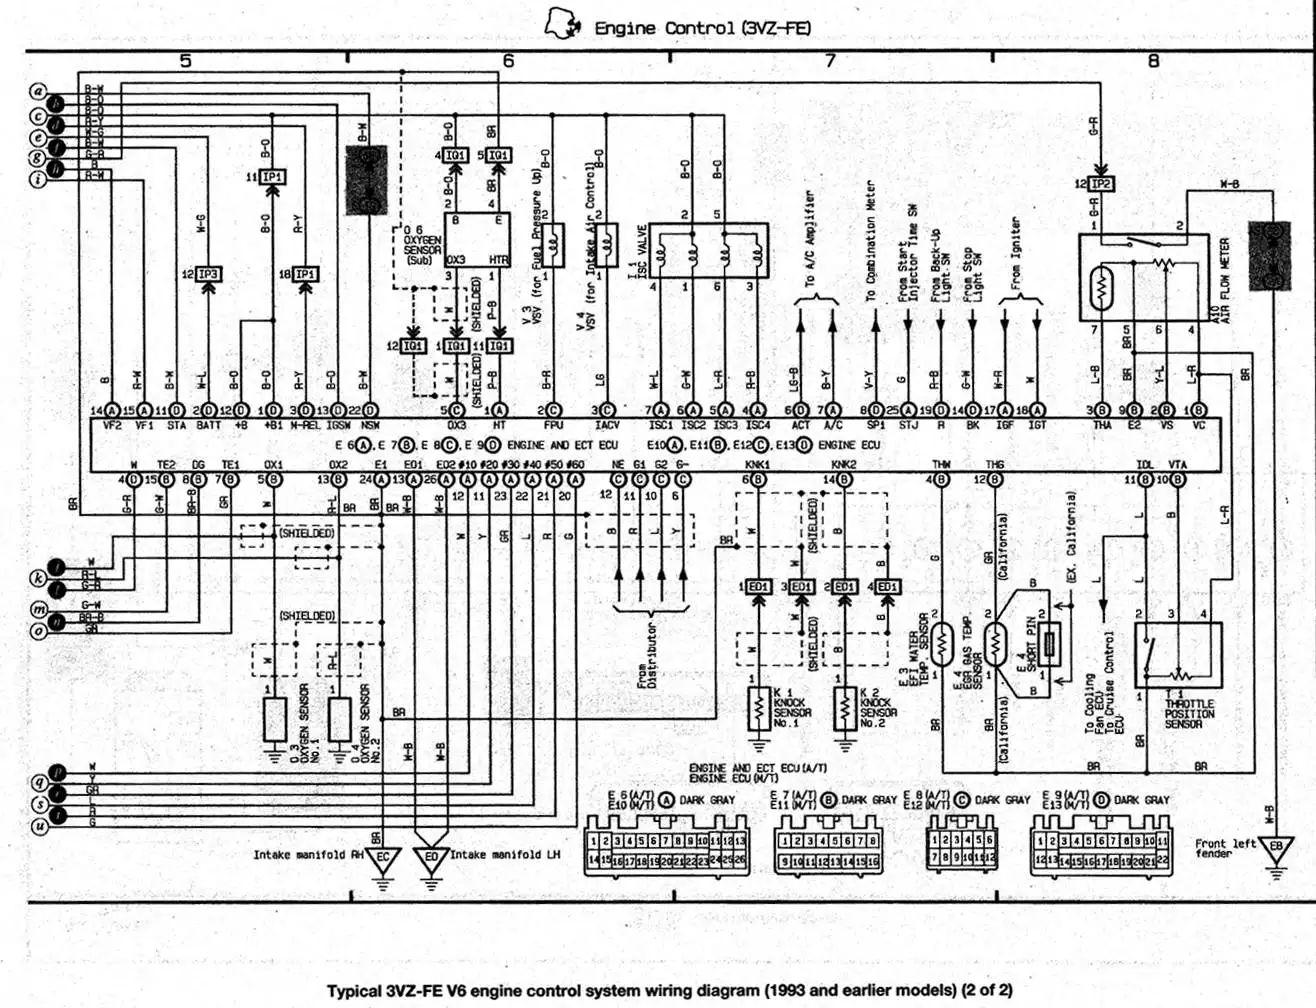 daihatsu move latte wiring diagram